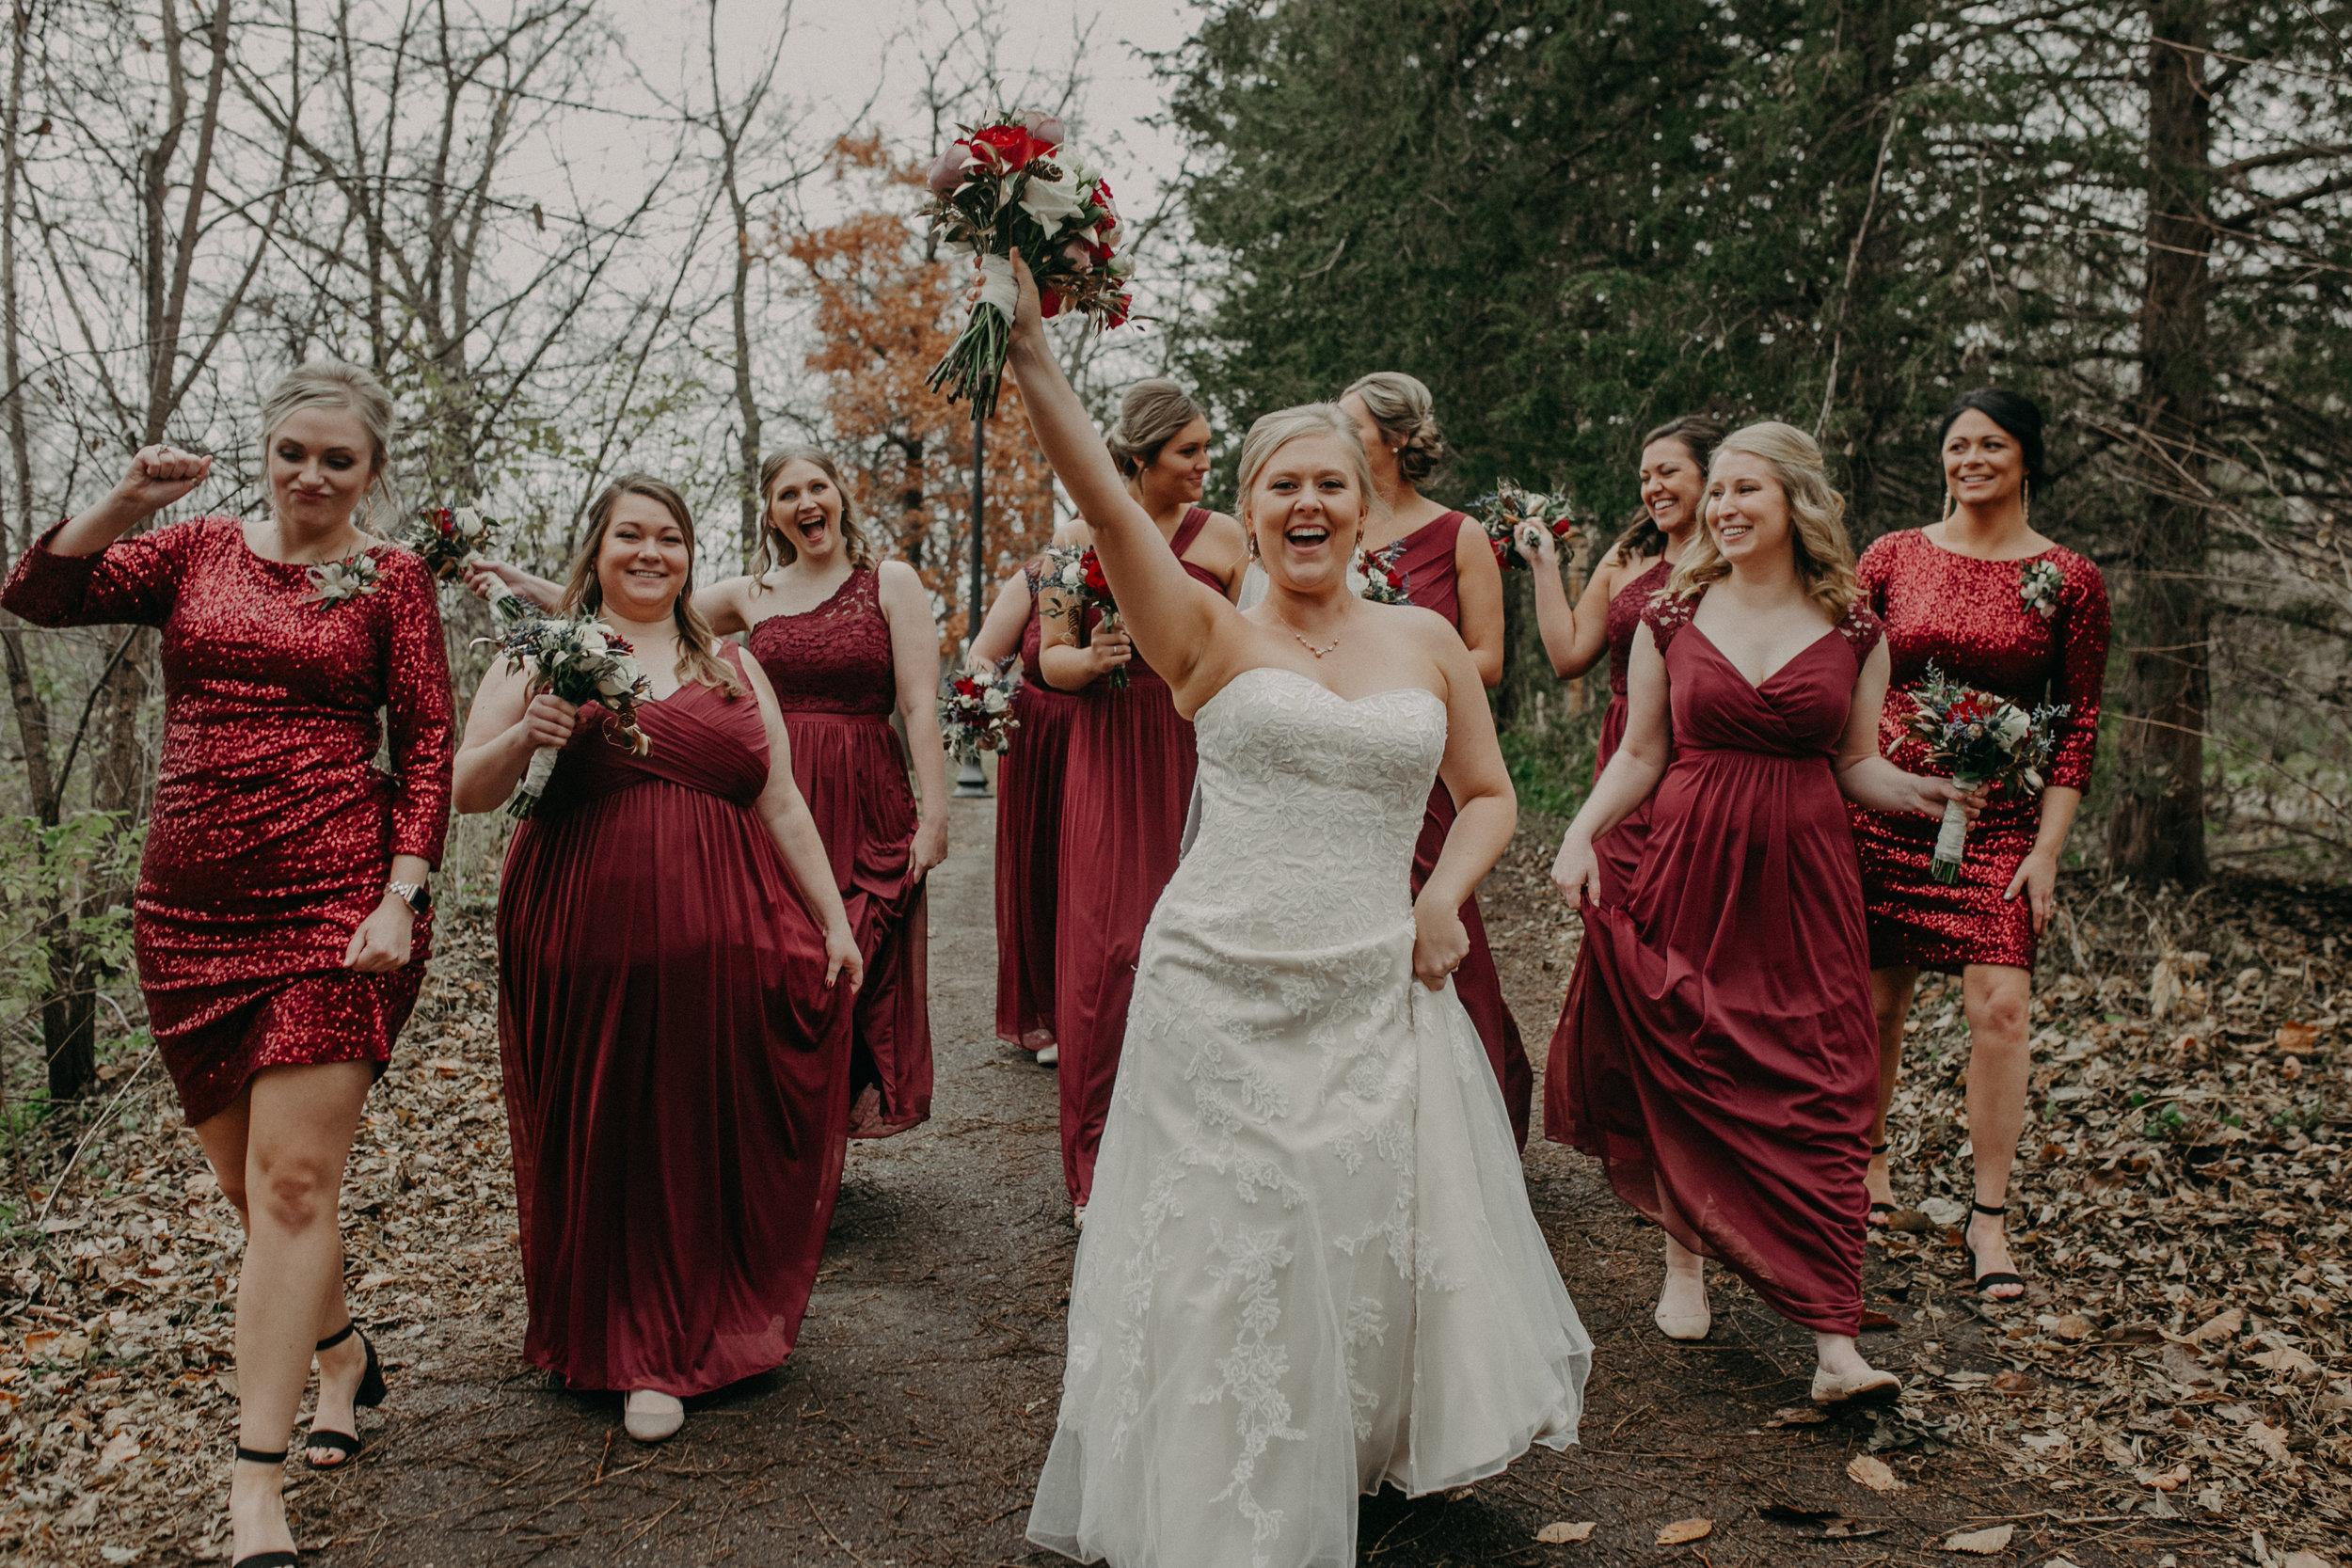 Weisenbeck_Wedding_Oct2018-488.jpg